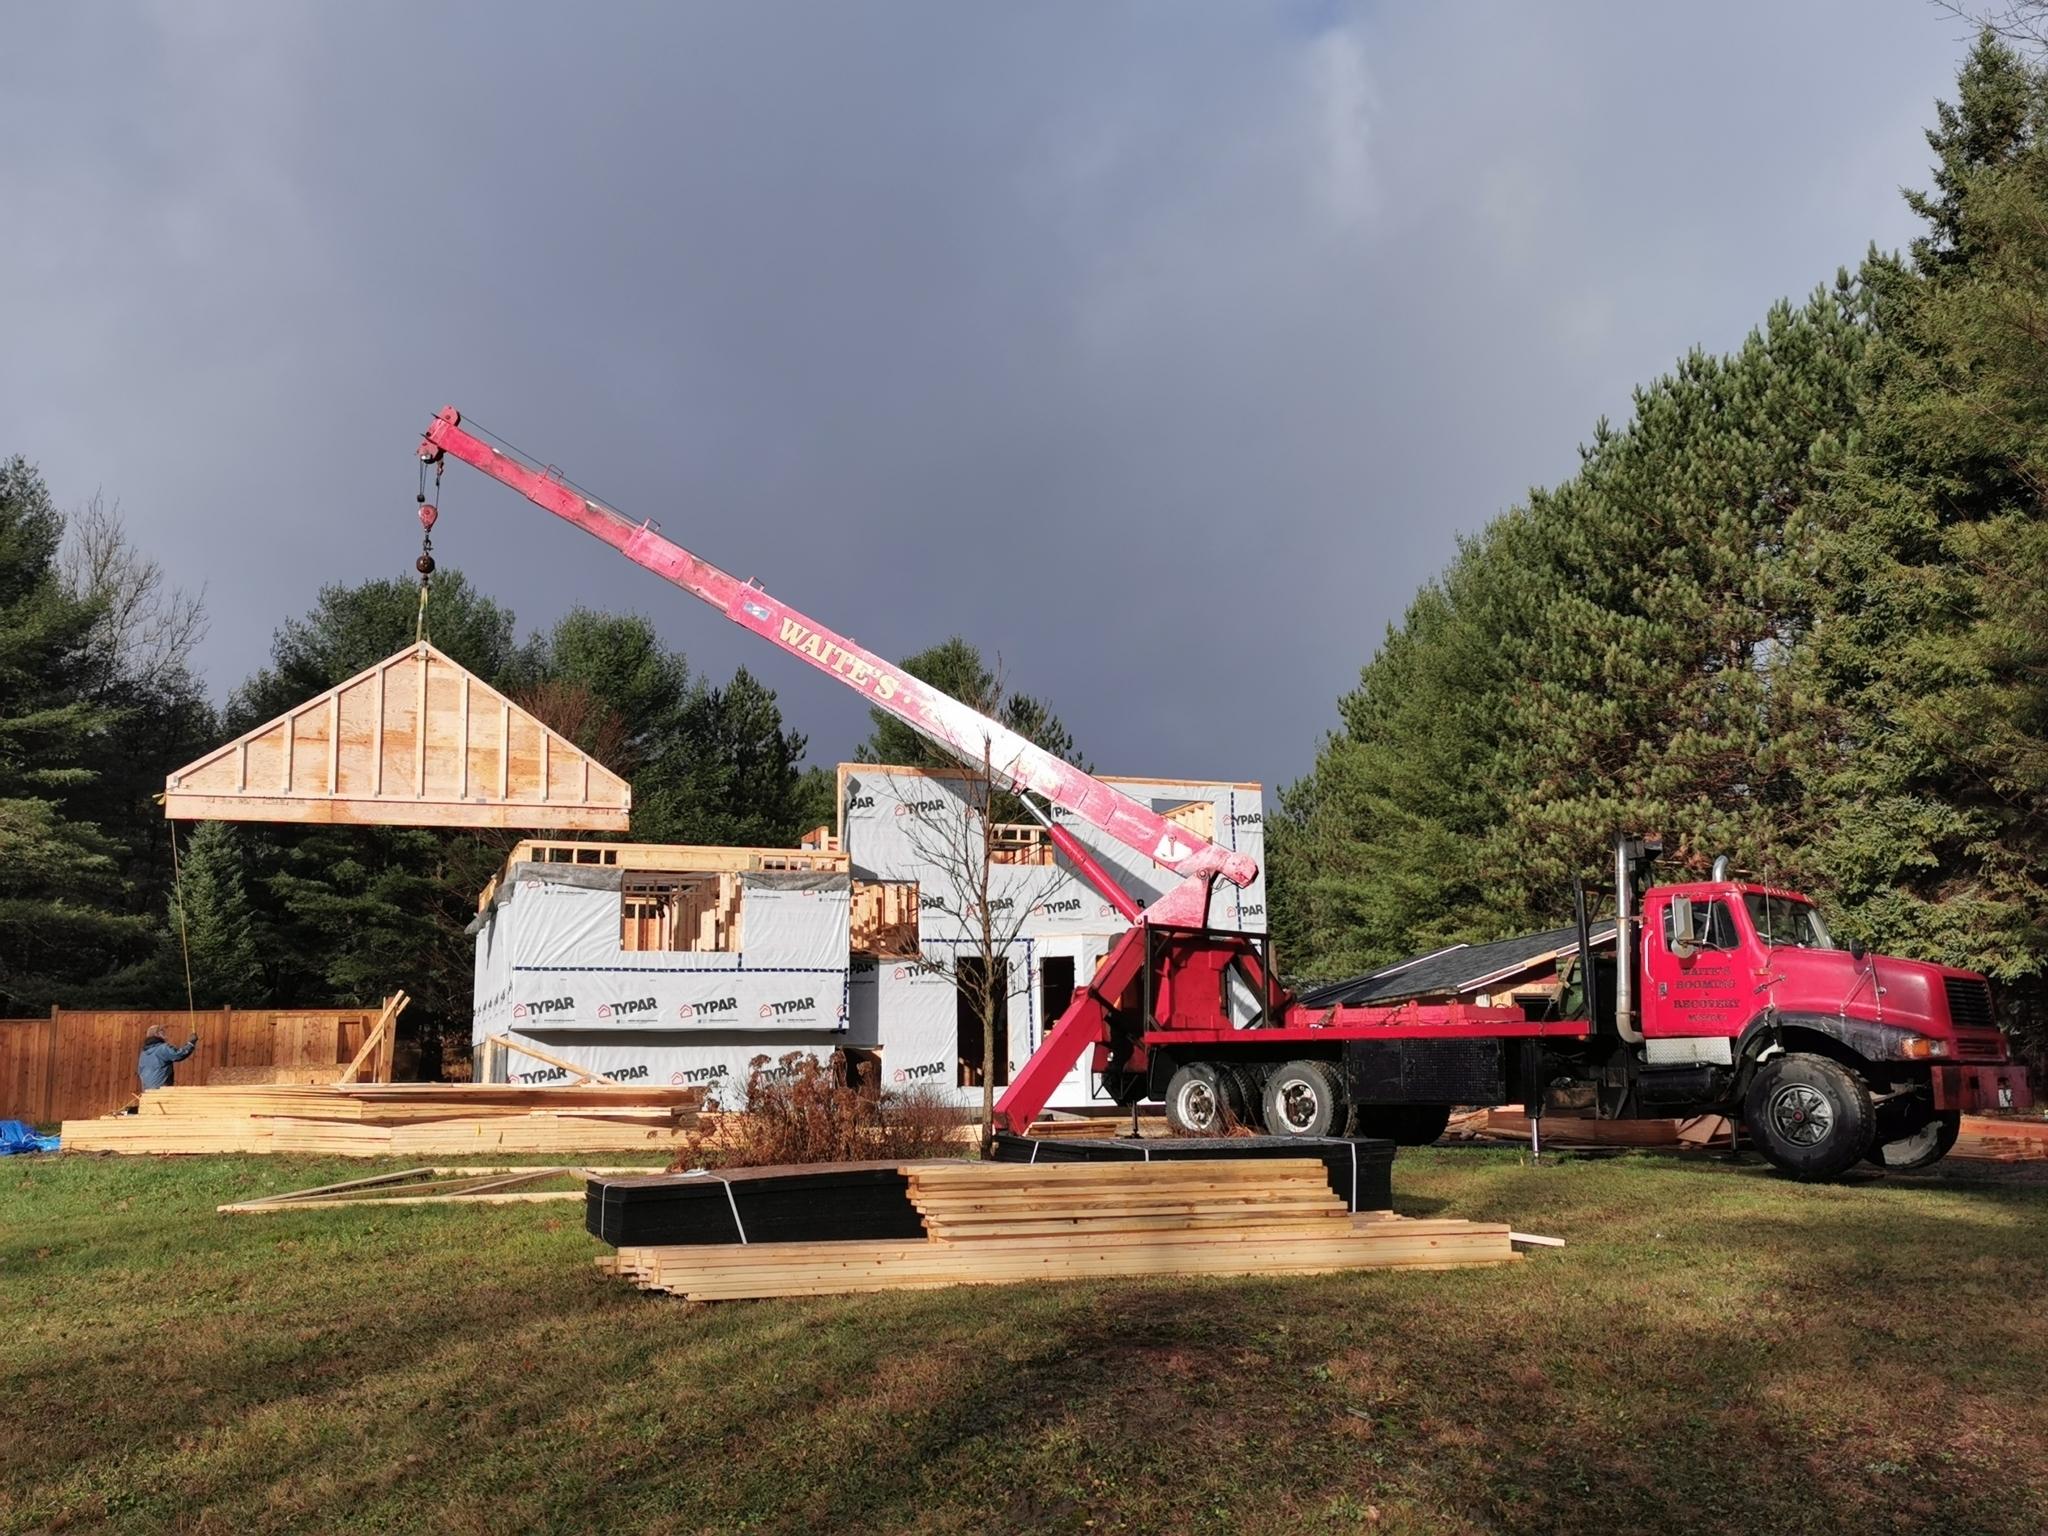 Waite's Boom Truck Service